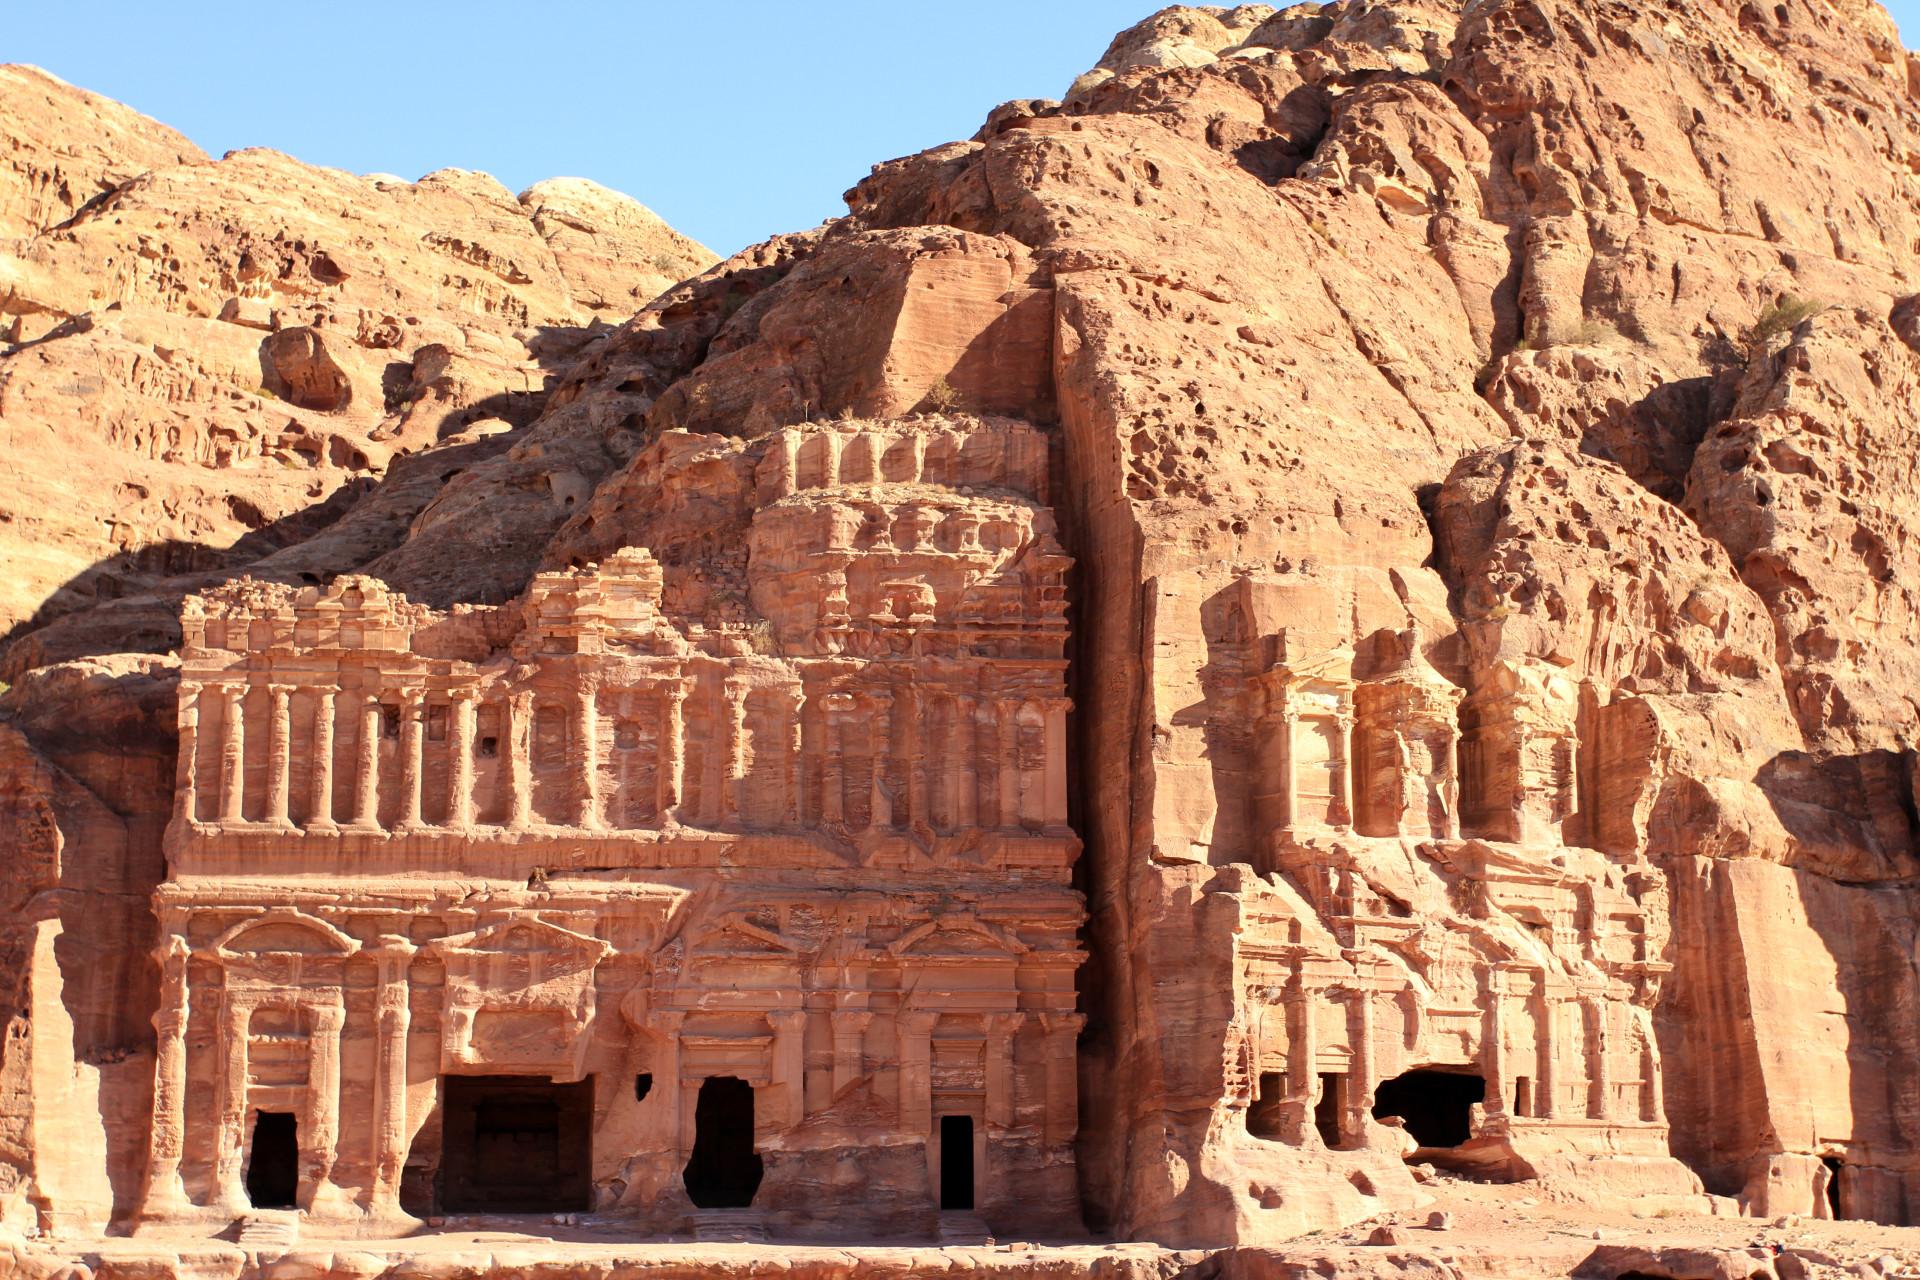 Uitgehakte gevels in Petra, Jordanië